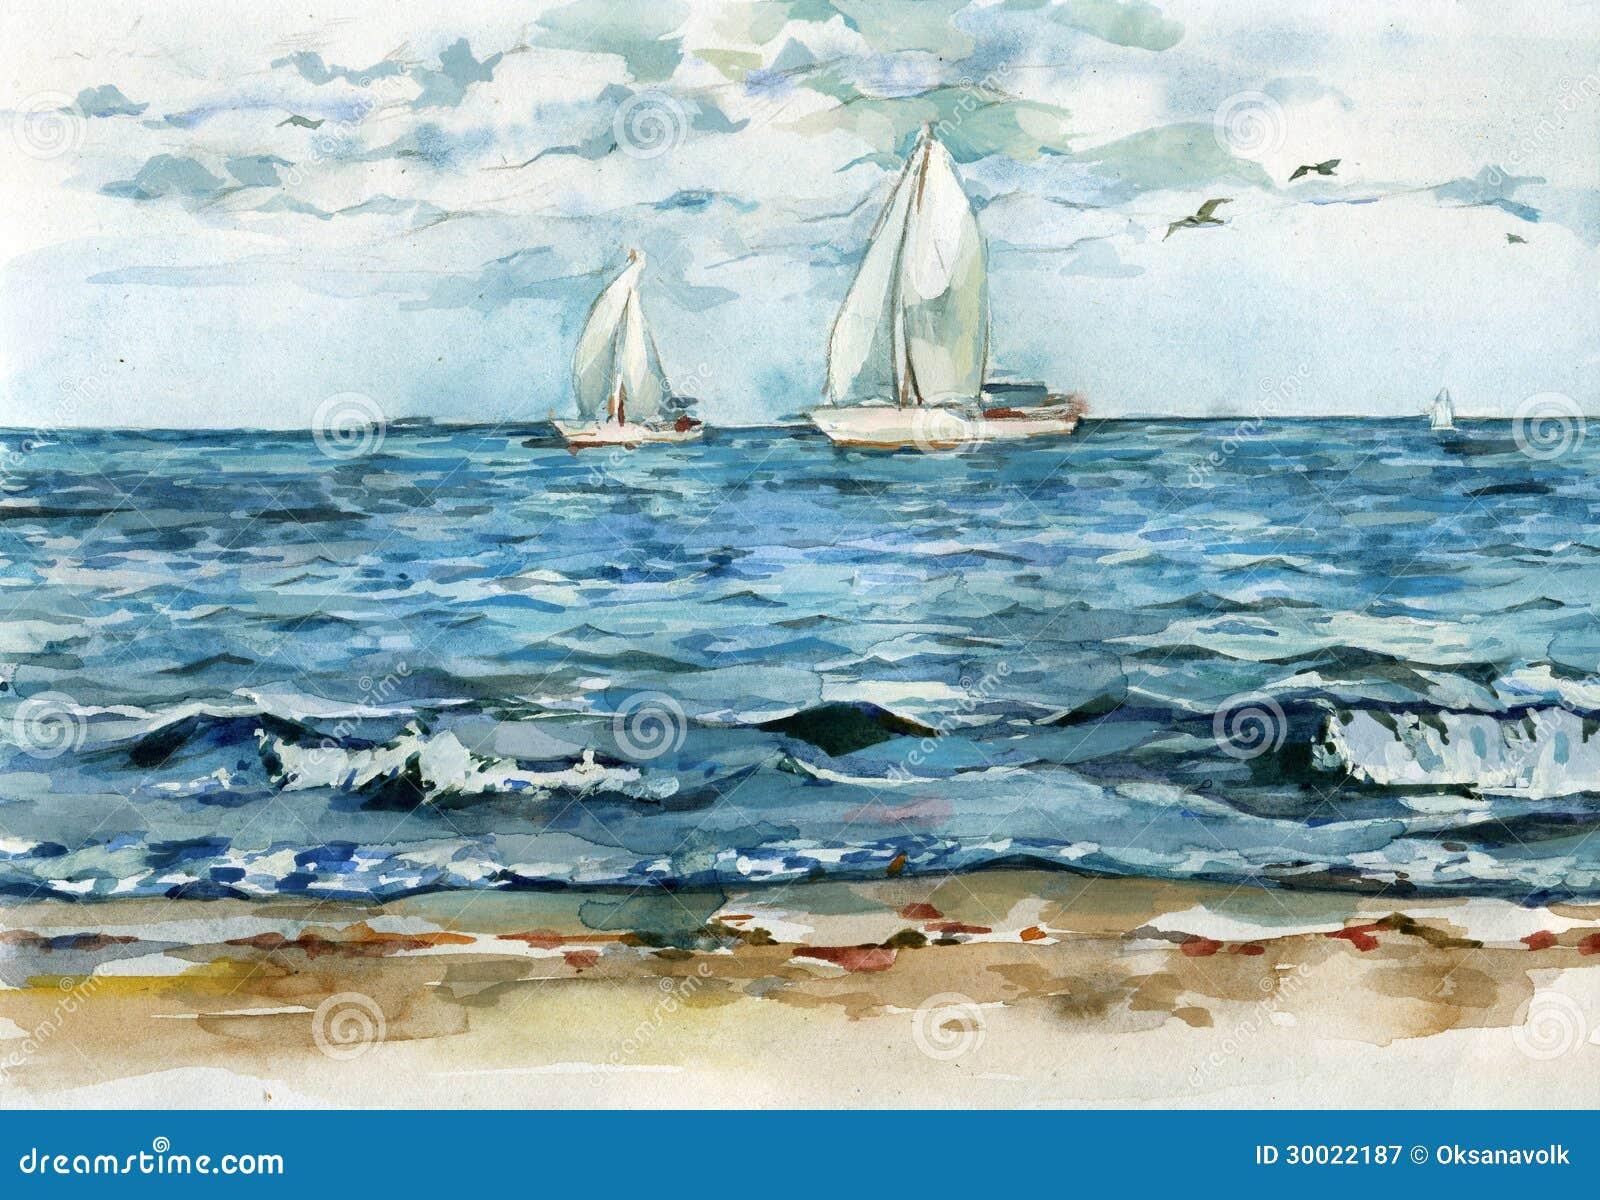 Navega el driftind en el ejemplo azul reservado de la acuarela del mar